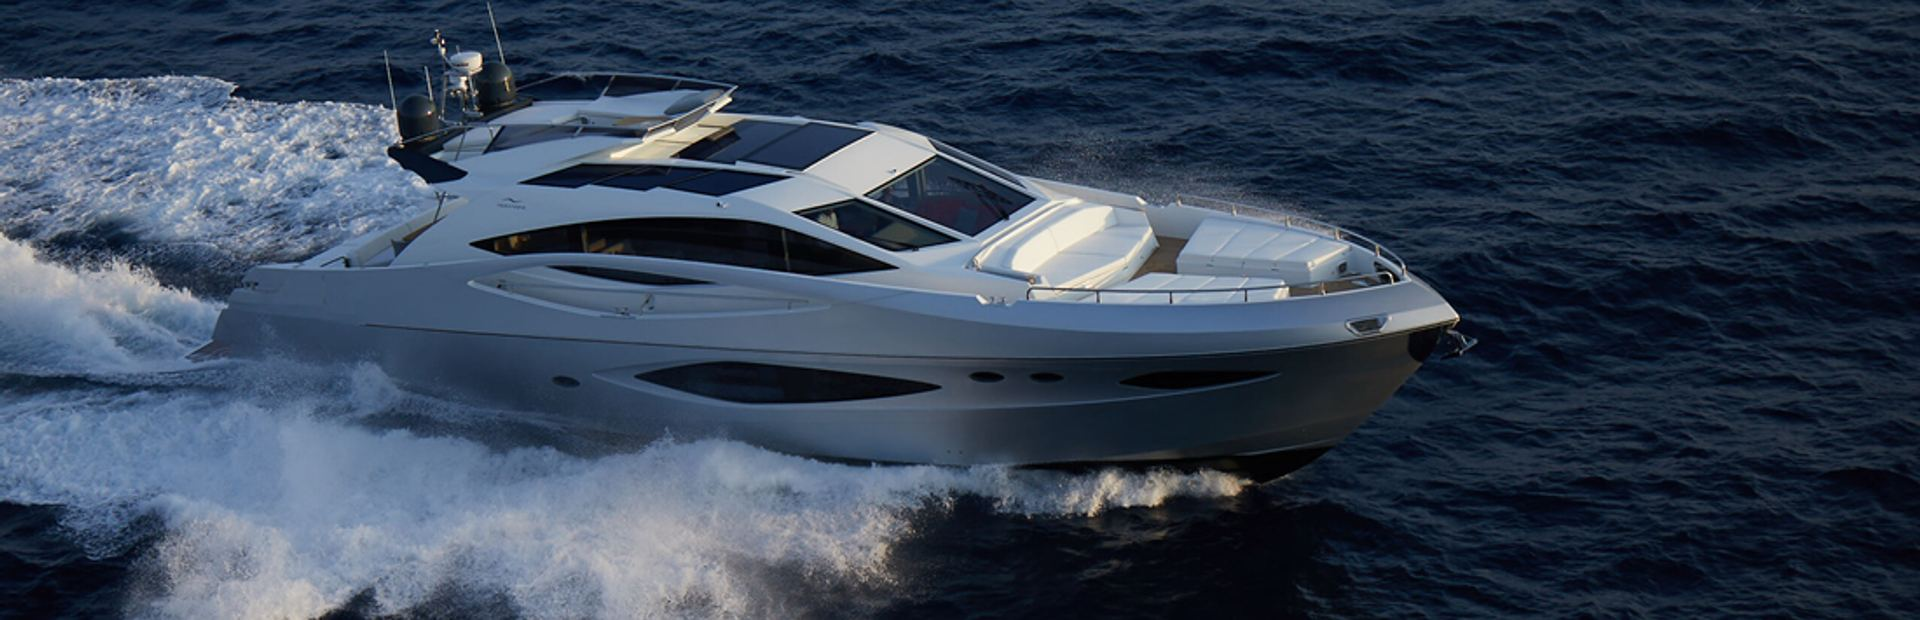 78 HTS Yacht Charter